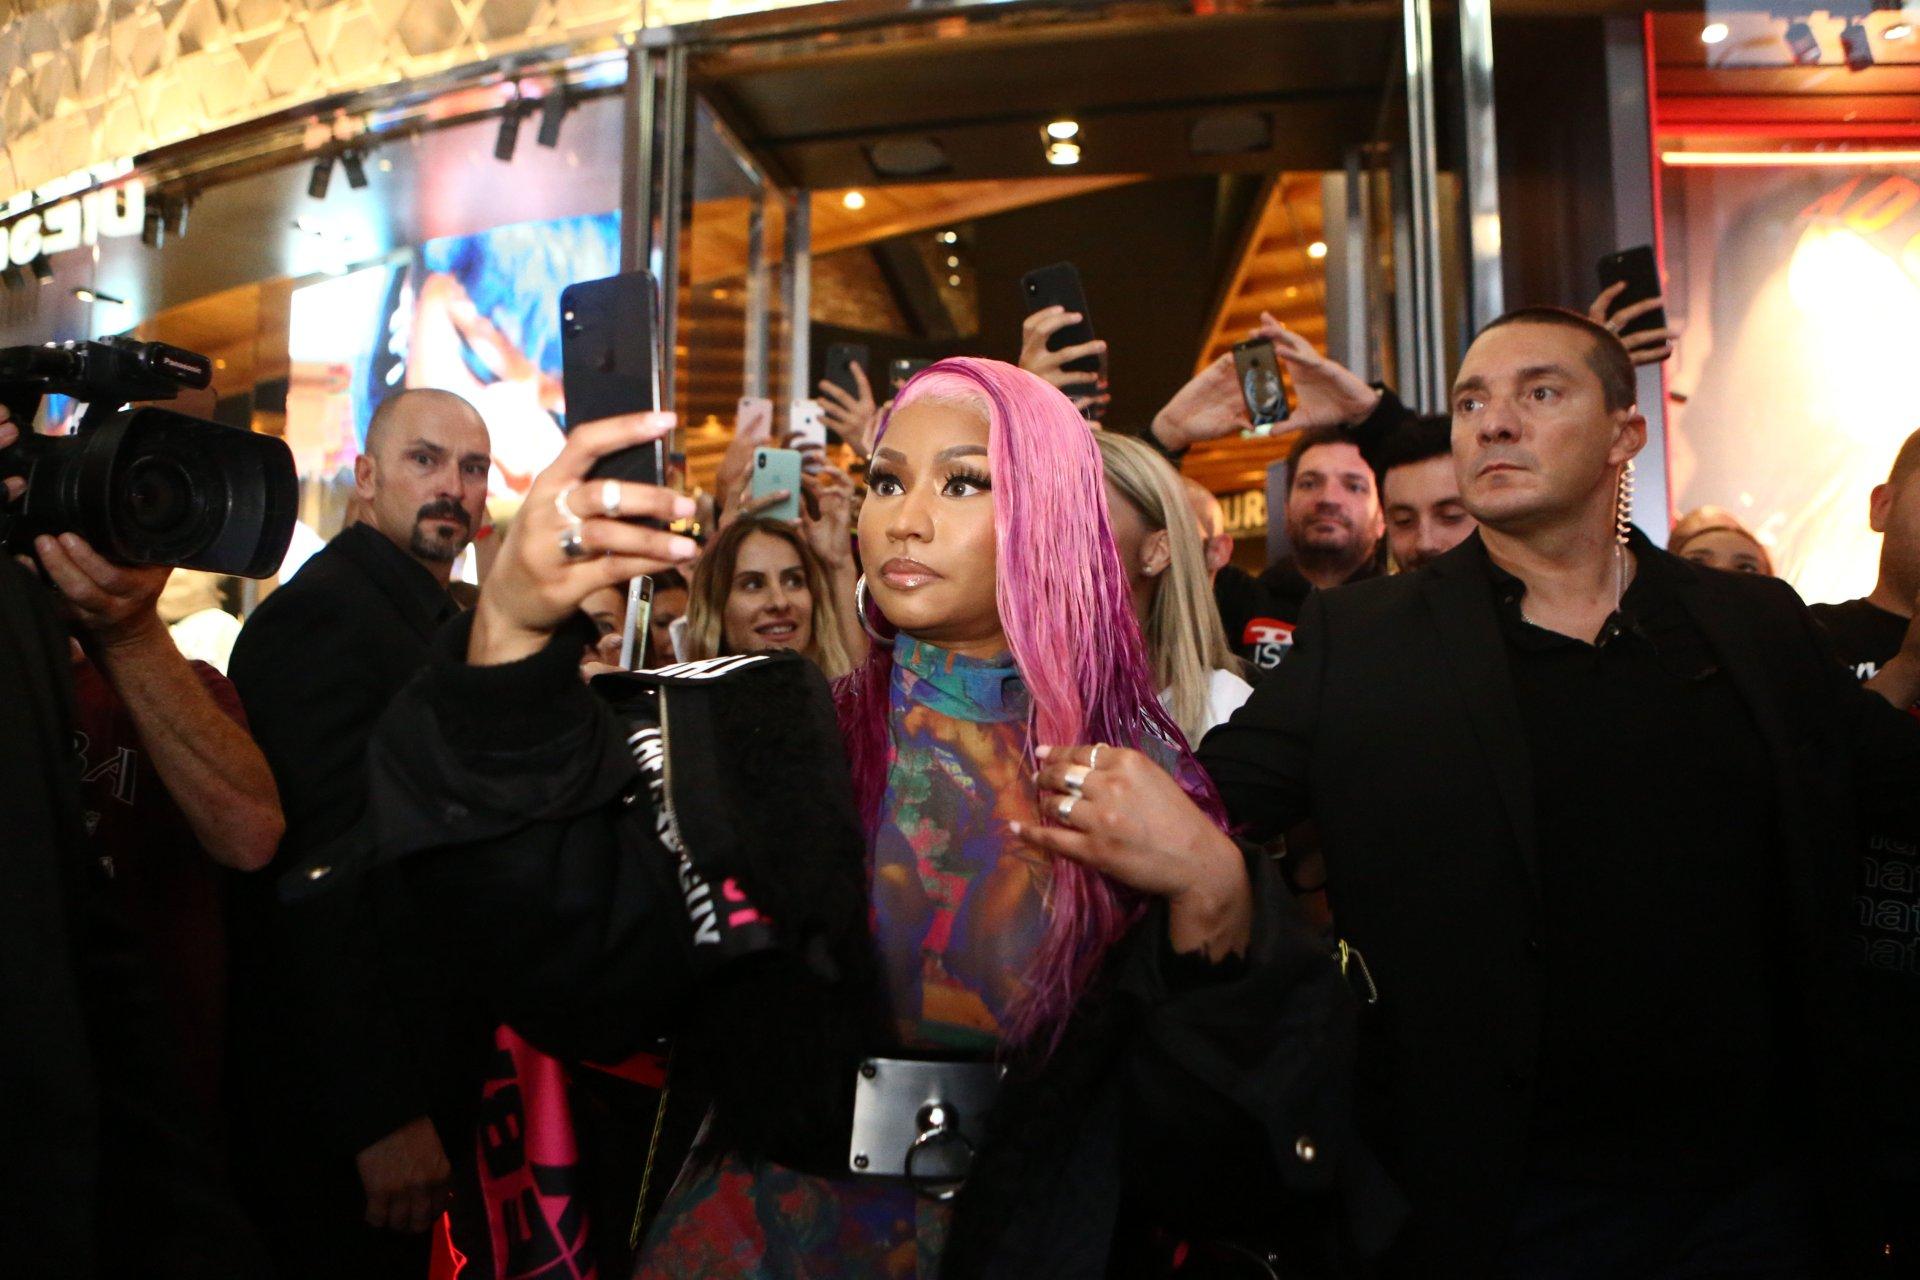 Nicki-Minaj-See-Through-TheFappeningBlog.com-51.jpg